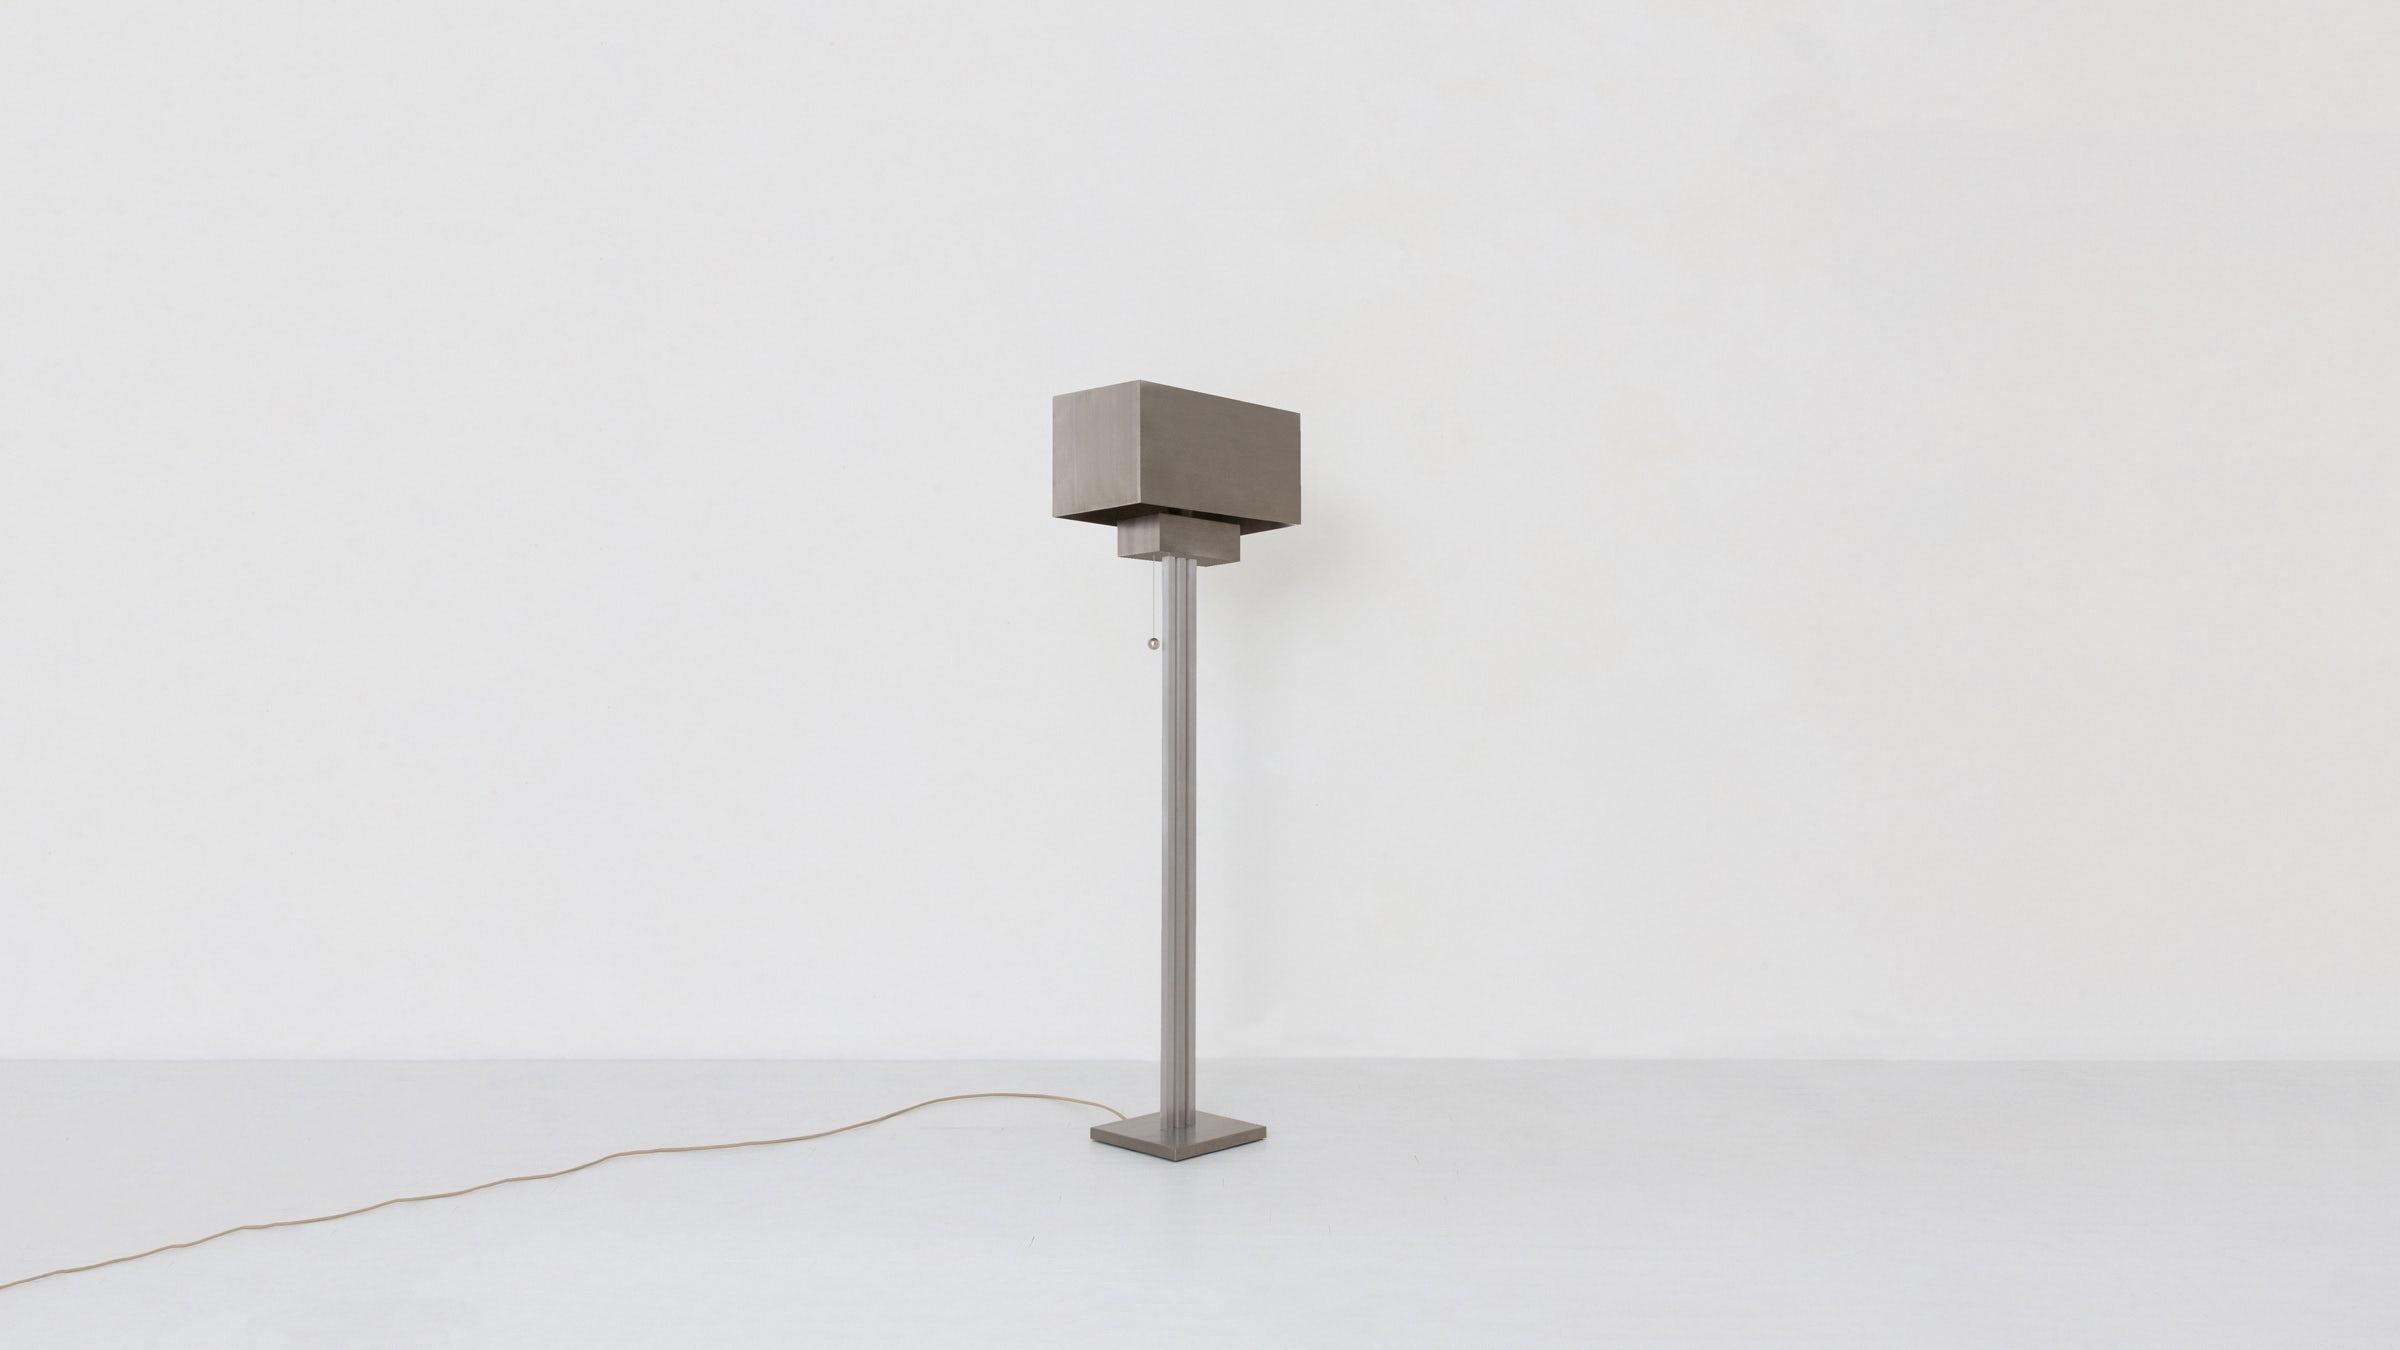 gallery image for Block Floor Lamp